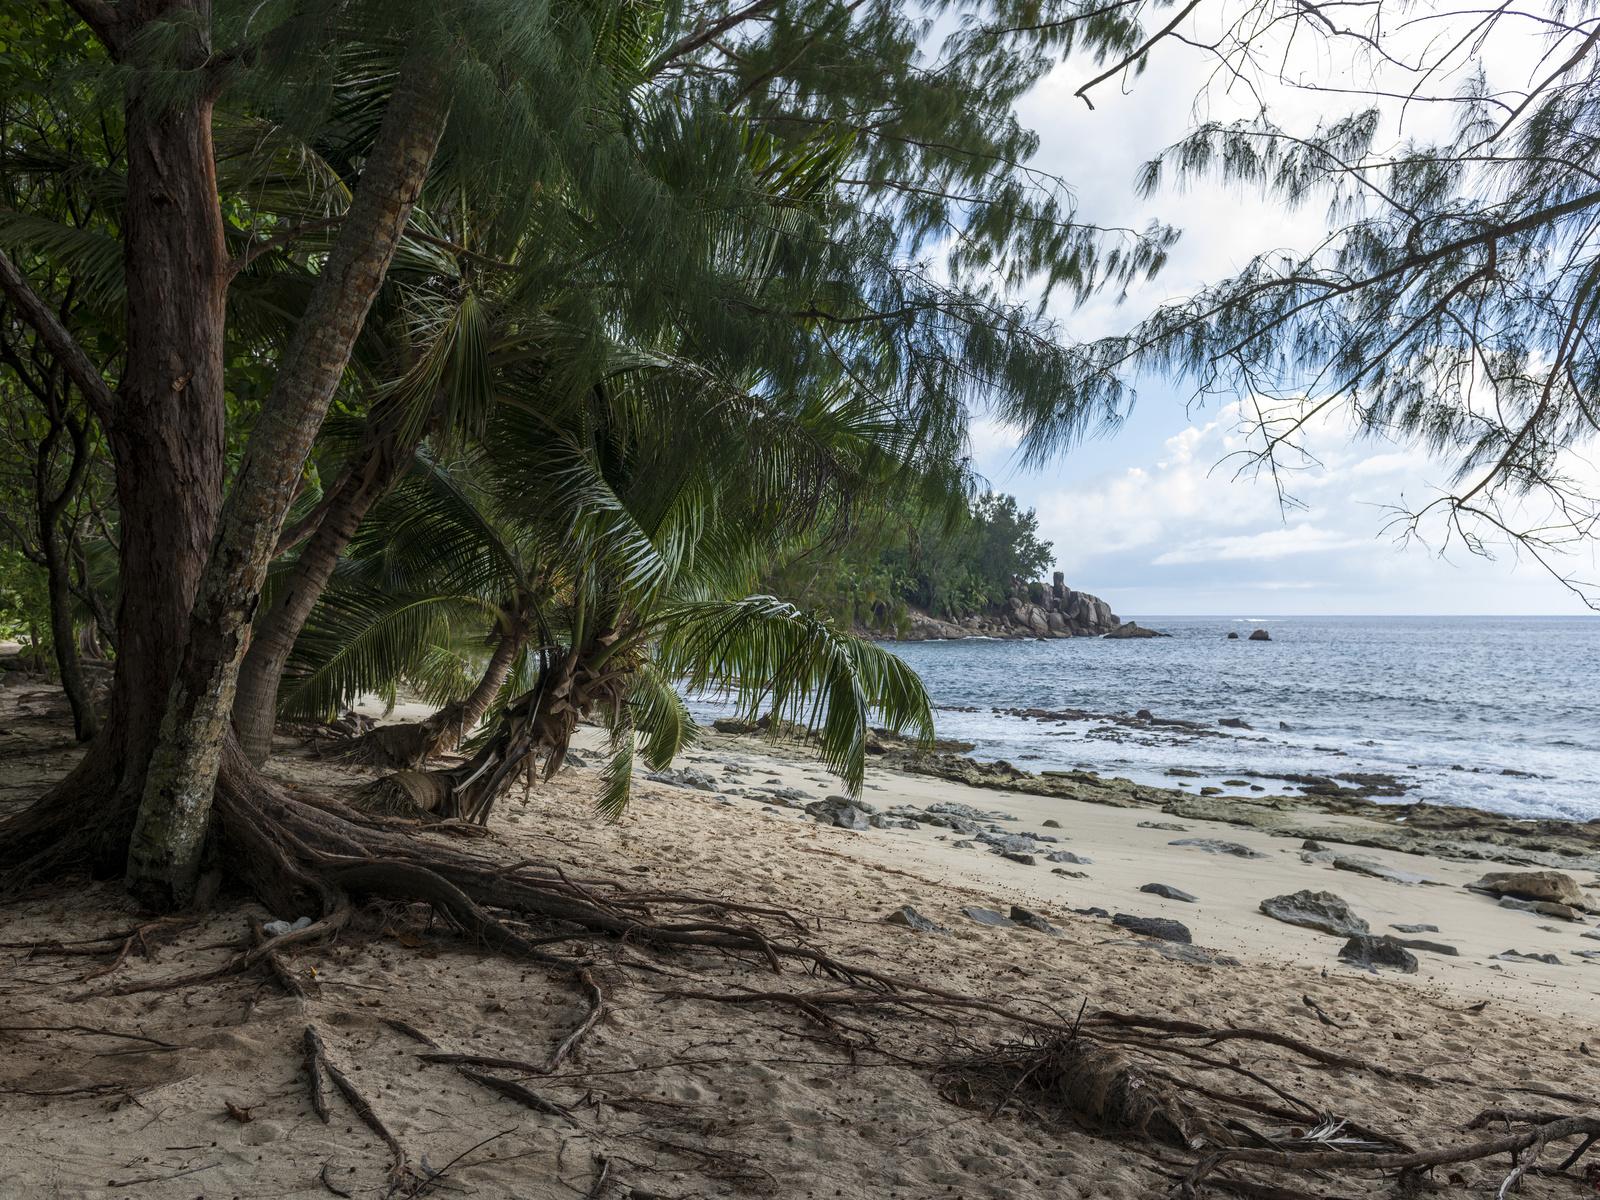 тропики, берег, побережье, police beach seychelles, пальмы, пляж, природа